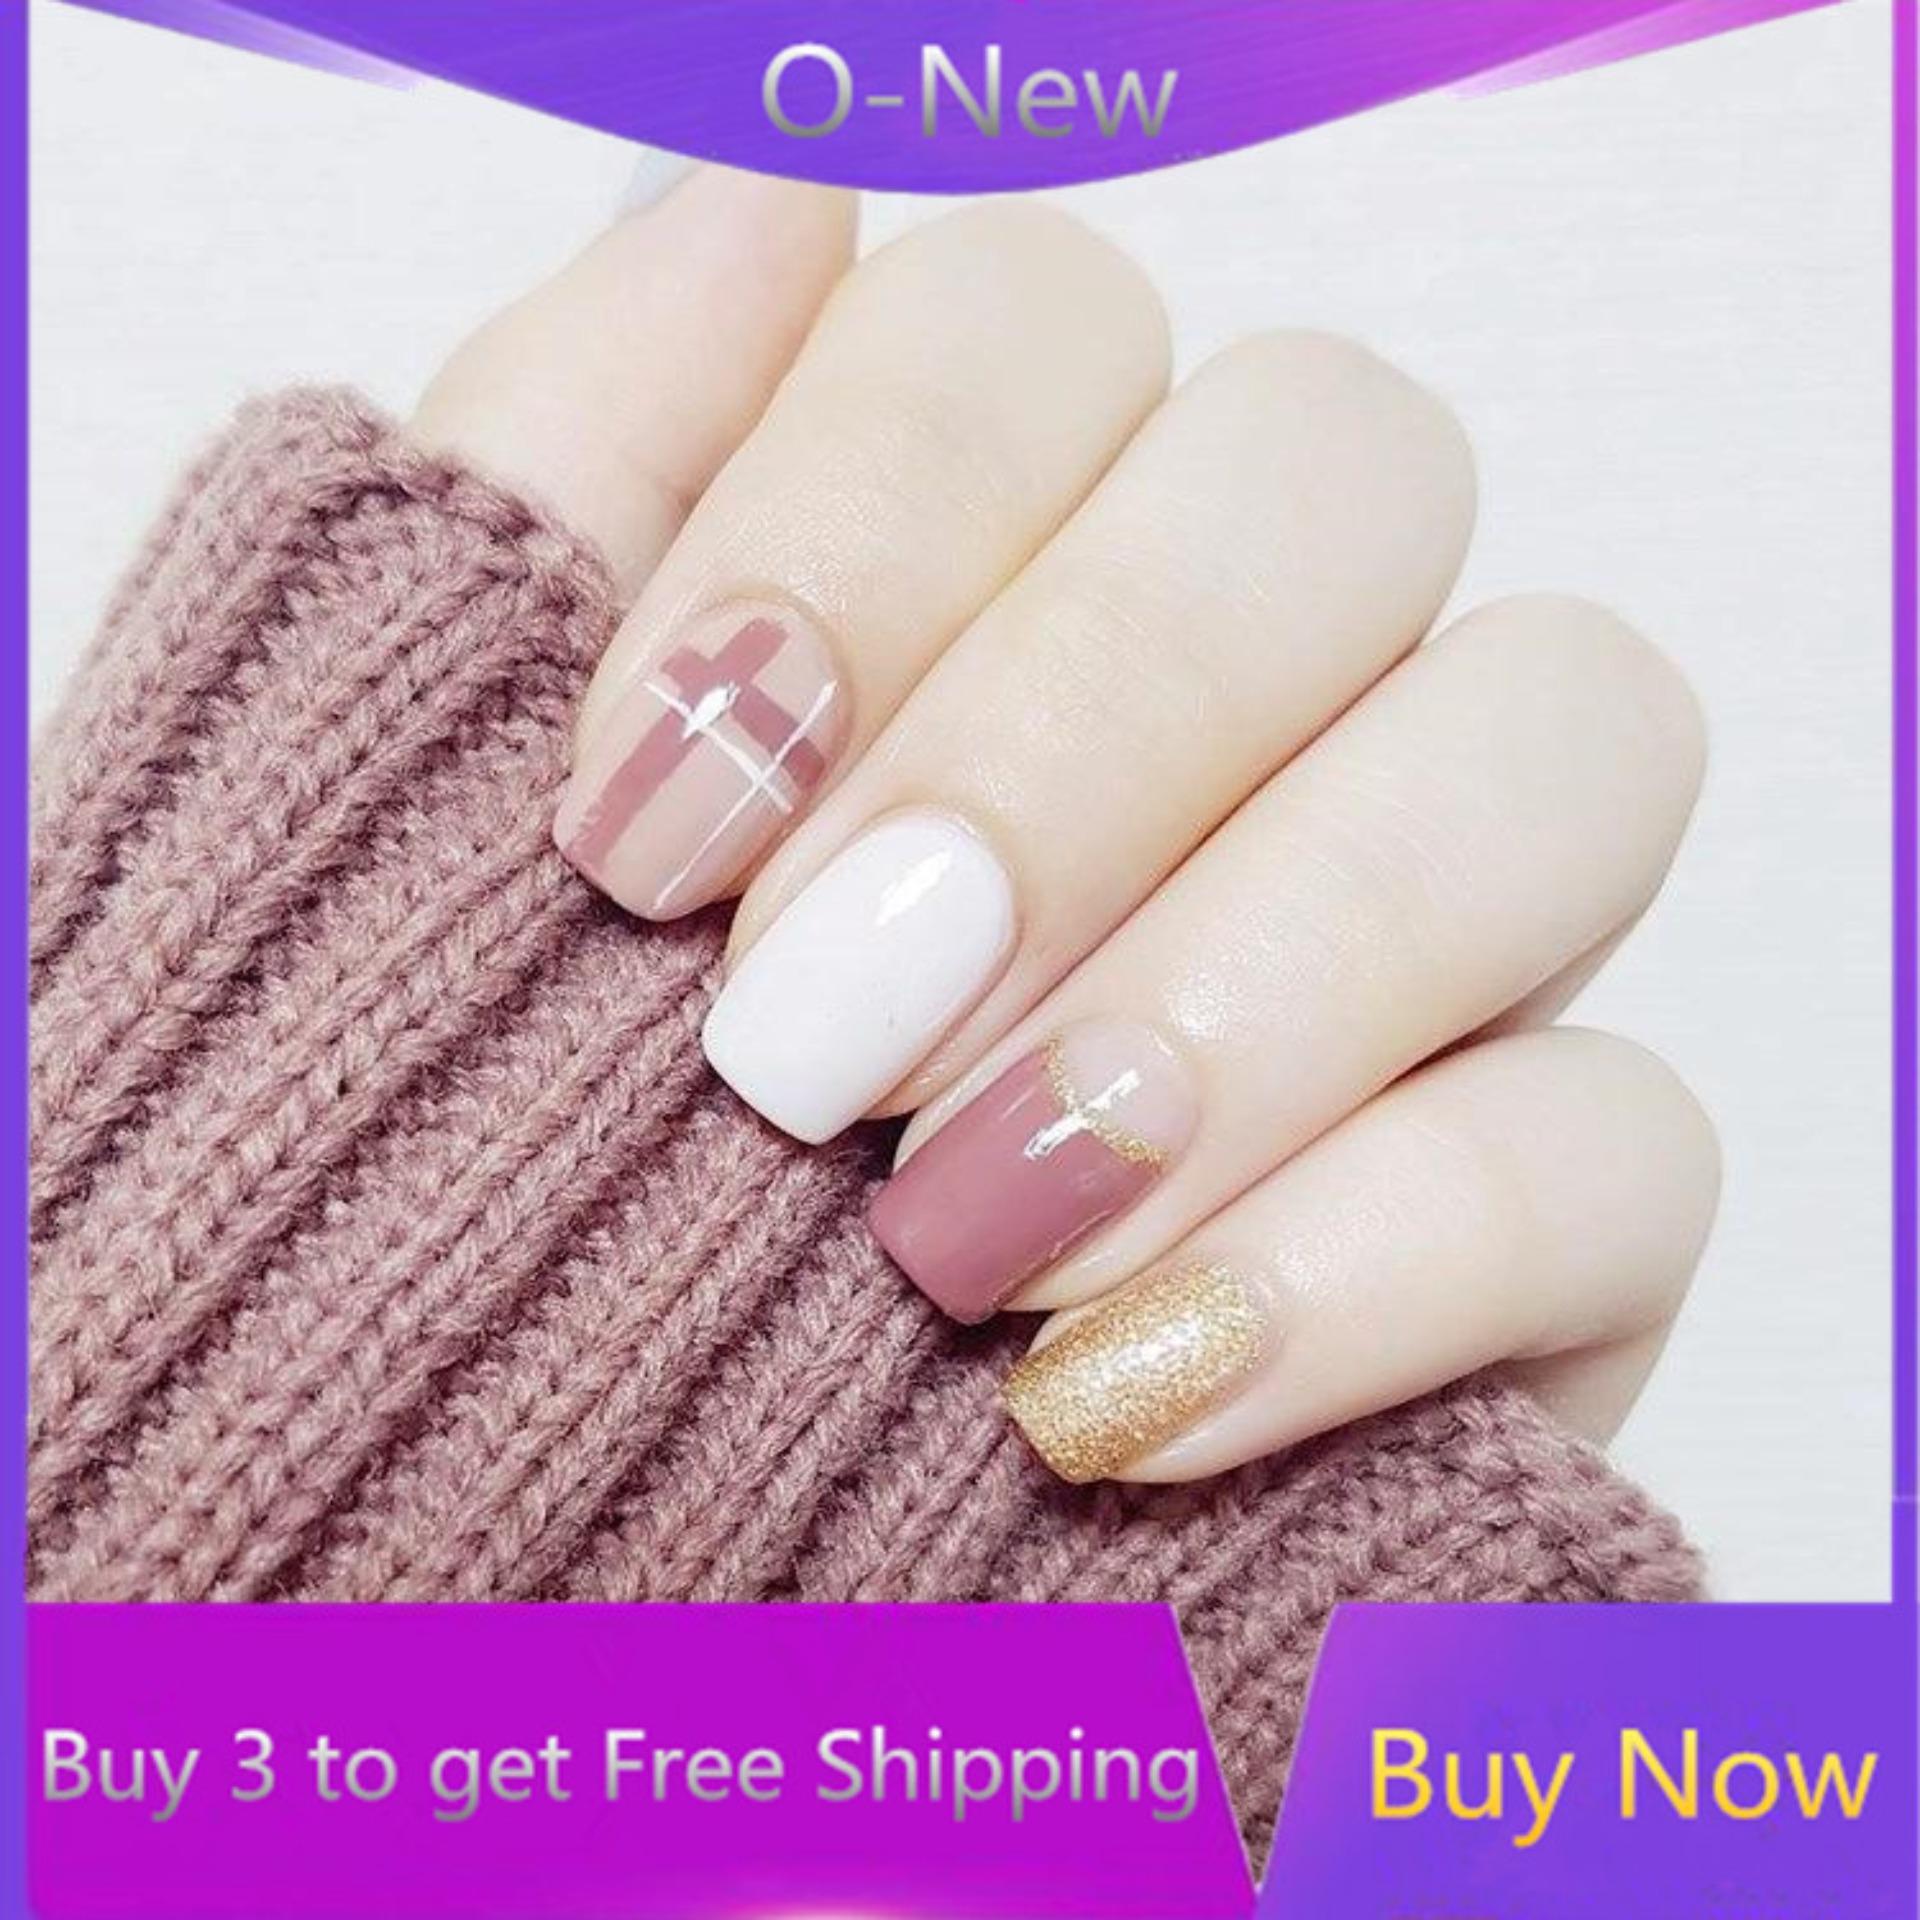 O-New 24Pcs French False Nail Stickers Nail Art Artificial Full Fake Nails Tips with